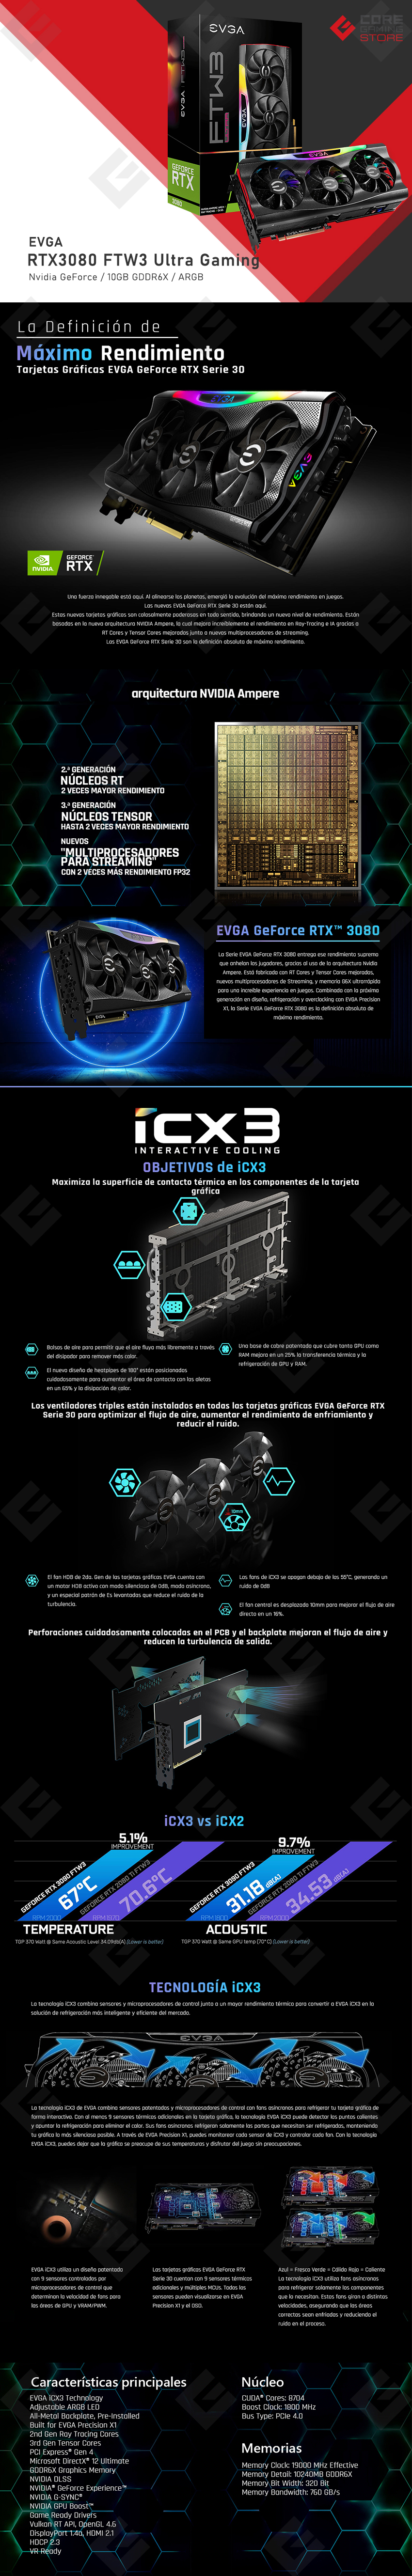 Tarjeta de Video Nvidia EVGA GeForce RTX 3080 FTW3 Ultra Gaming, 10GB GDDR6X, ARGB, Metal Blackplate - 10G-P5-3897-KR, (Para venta exclusiva en ensamble)